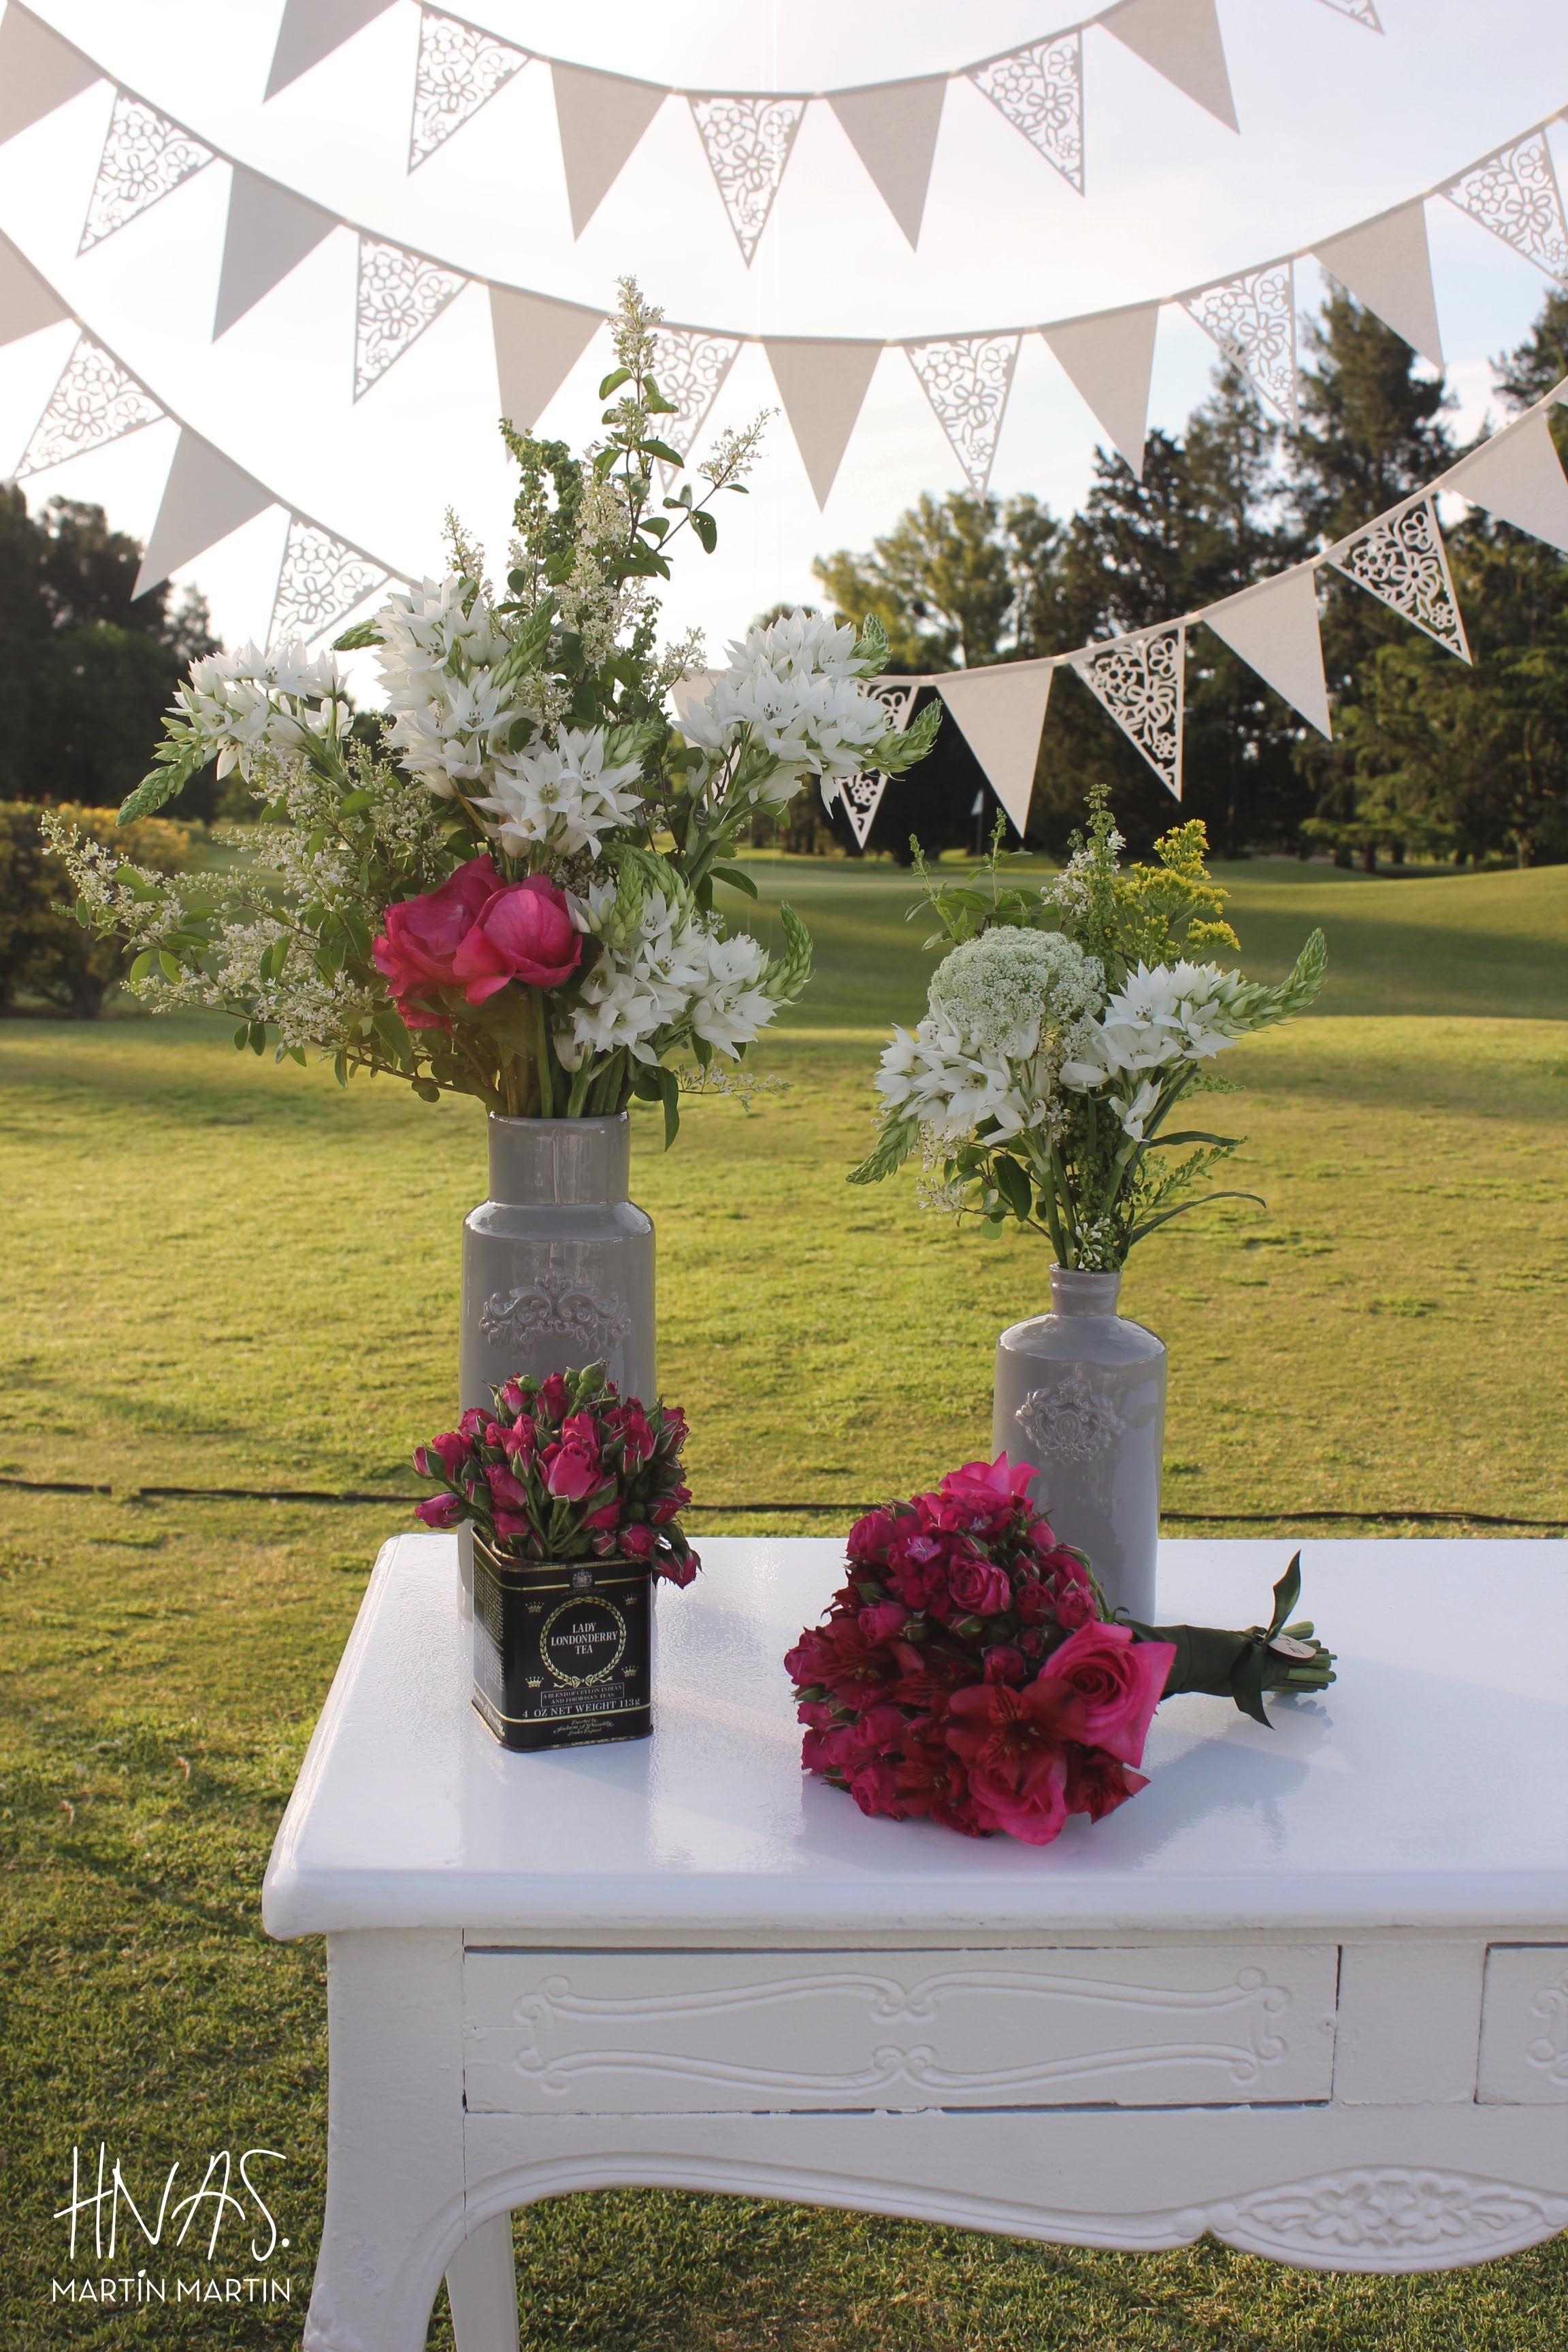 Matrimonio Civil Rustico : Casamiento boda civil aire libre campo de golf los